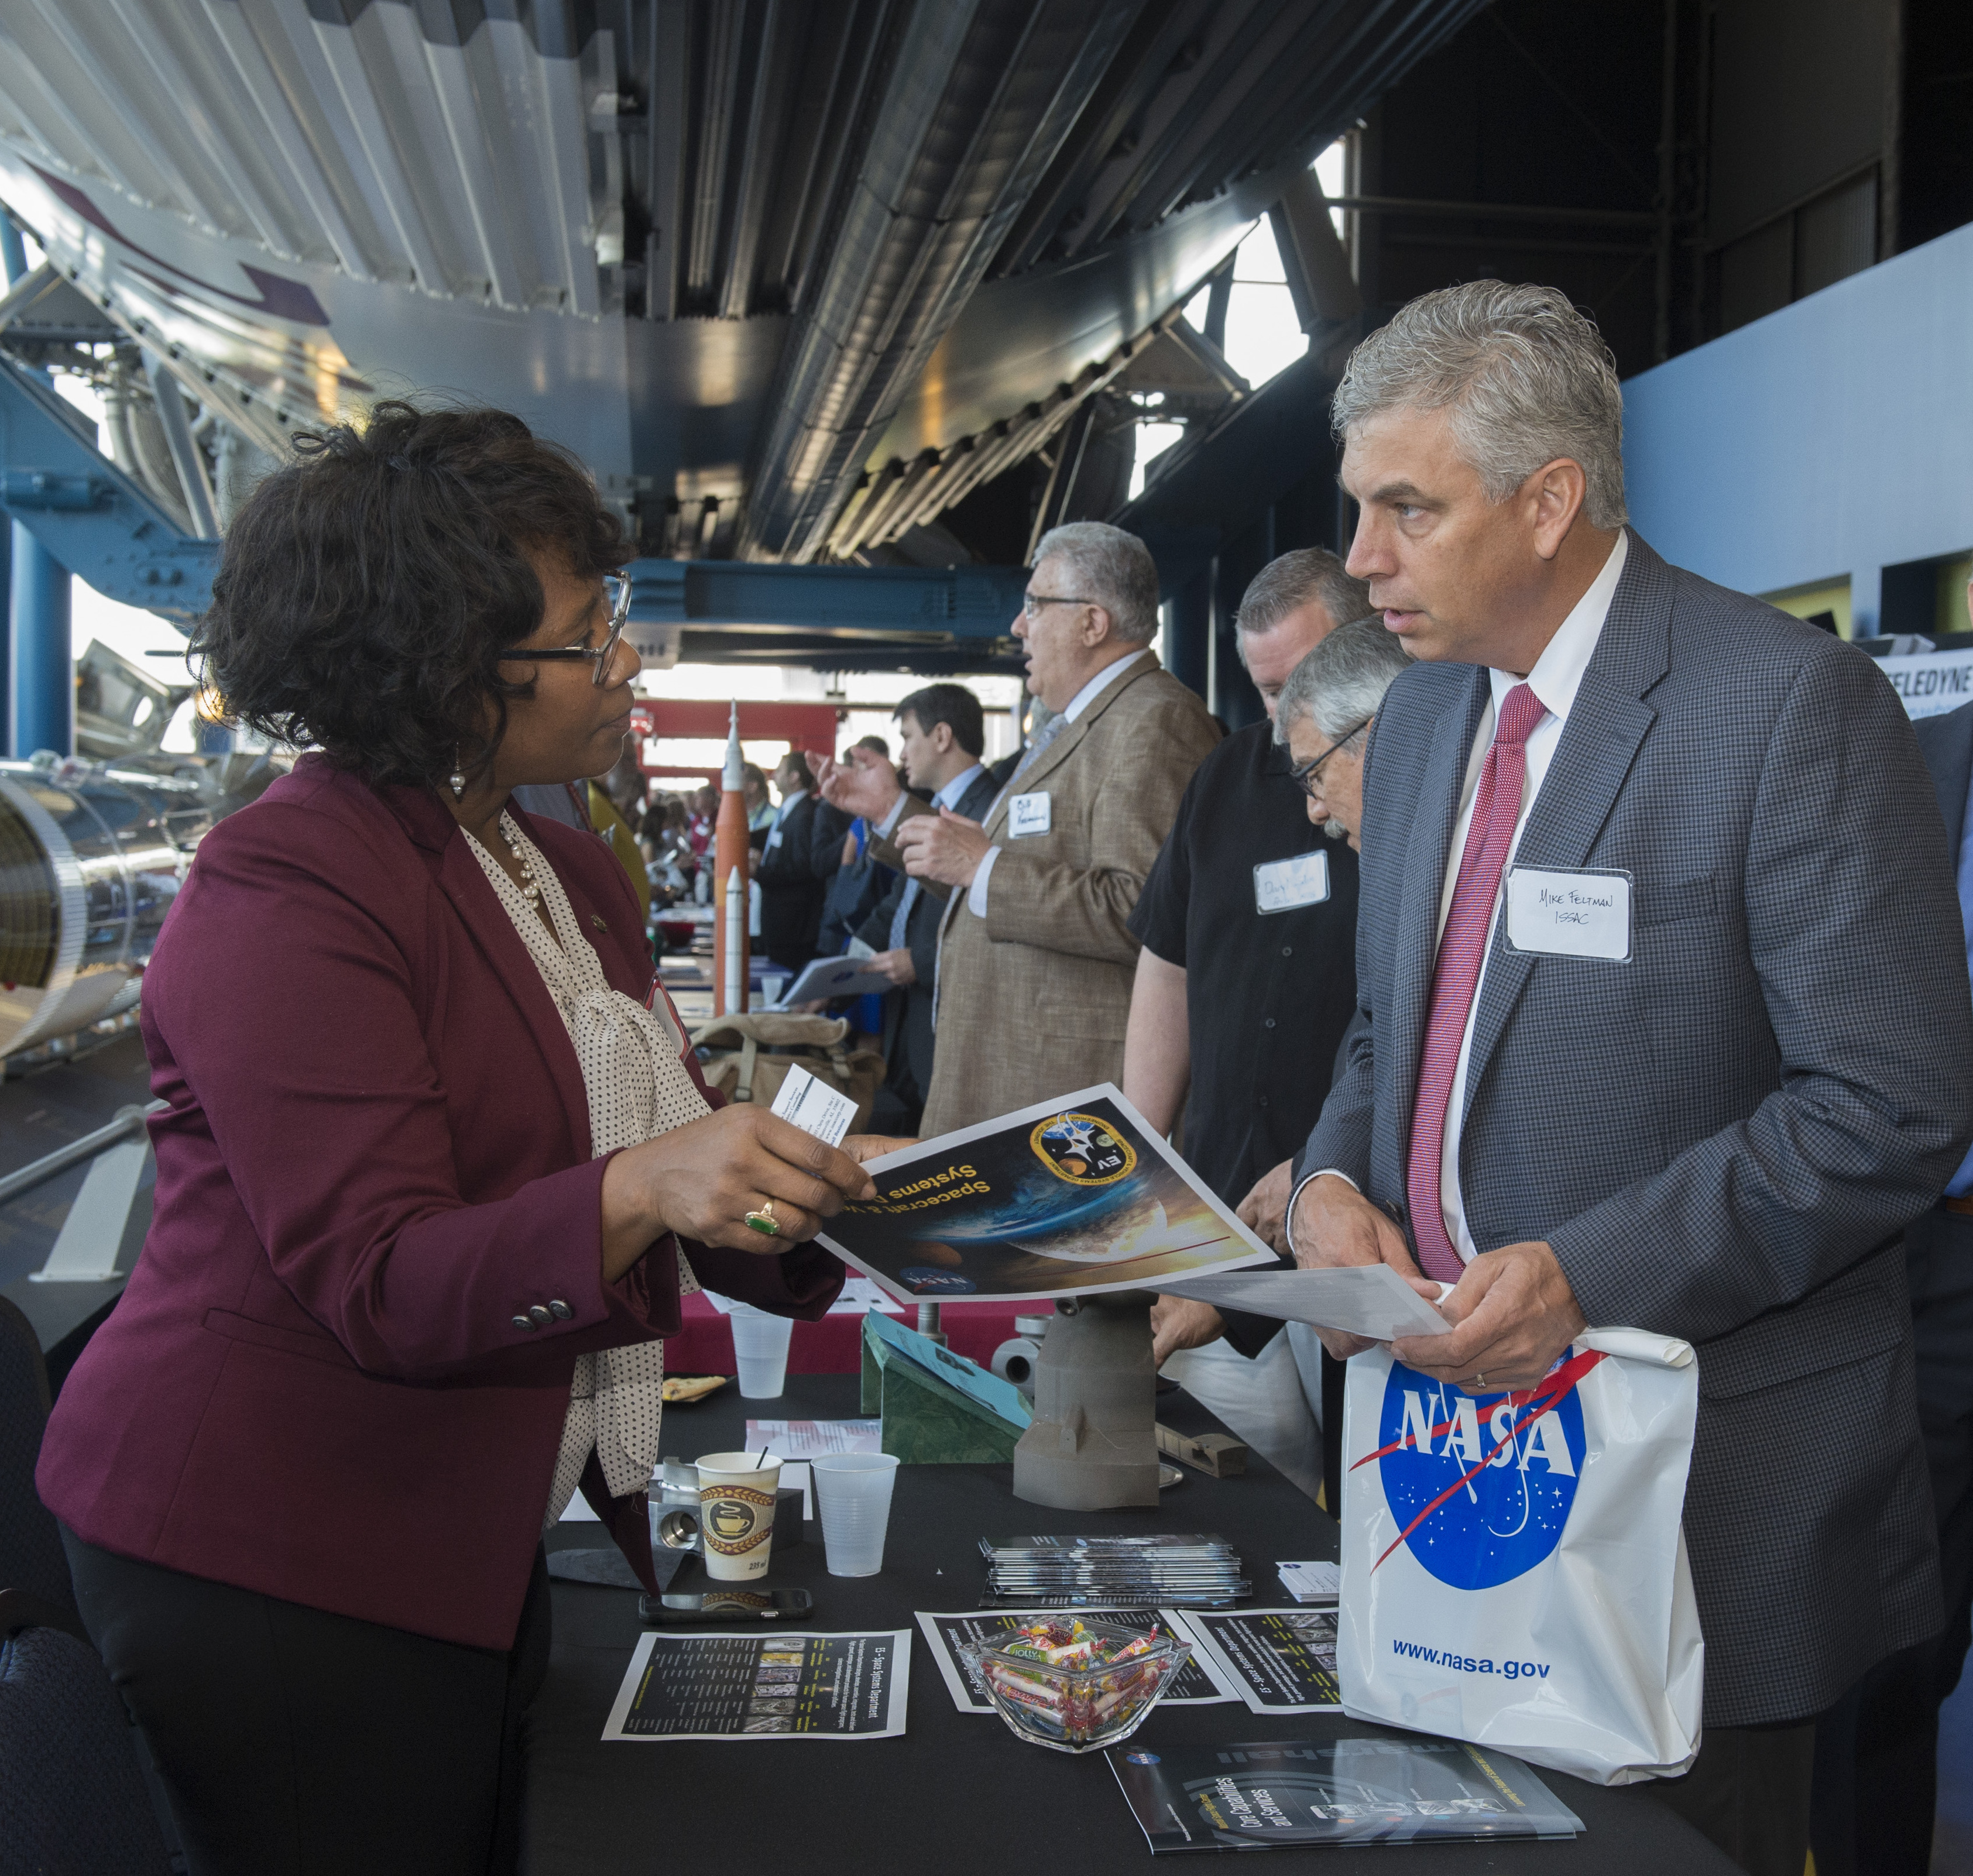 nasa marshall team member nadra hatchett left shares information about 3d printing and propulsion - Astronomy Jobs At Nasa